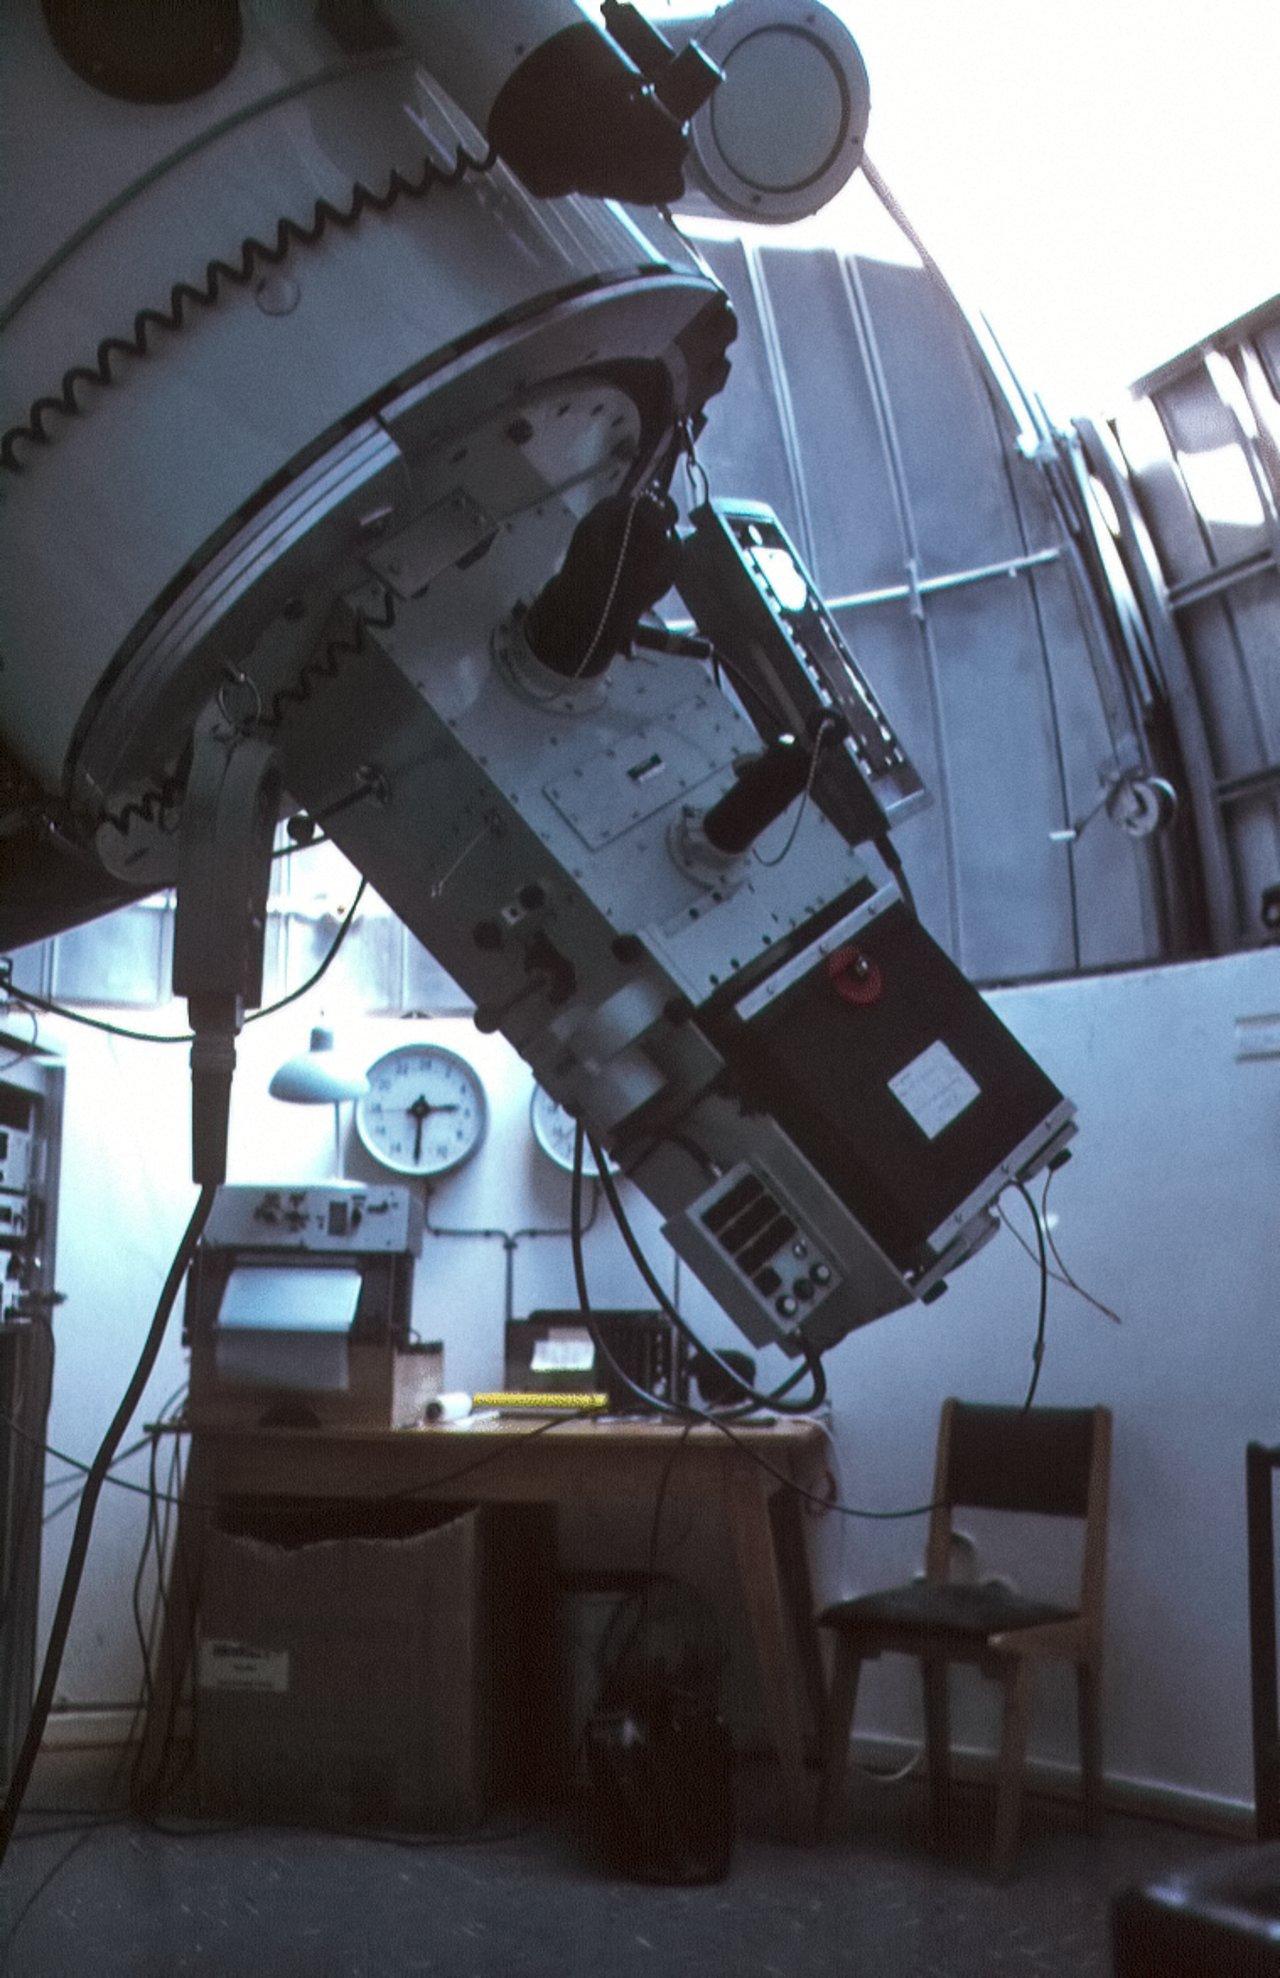 Bochum 0.61-metre telescope and control room